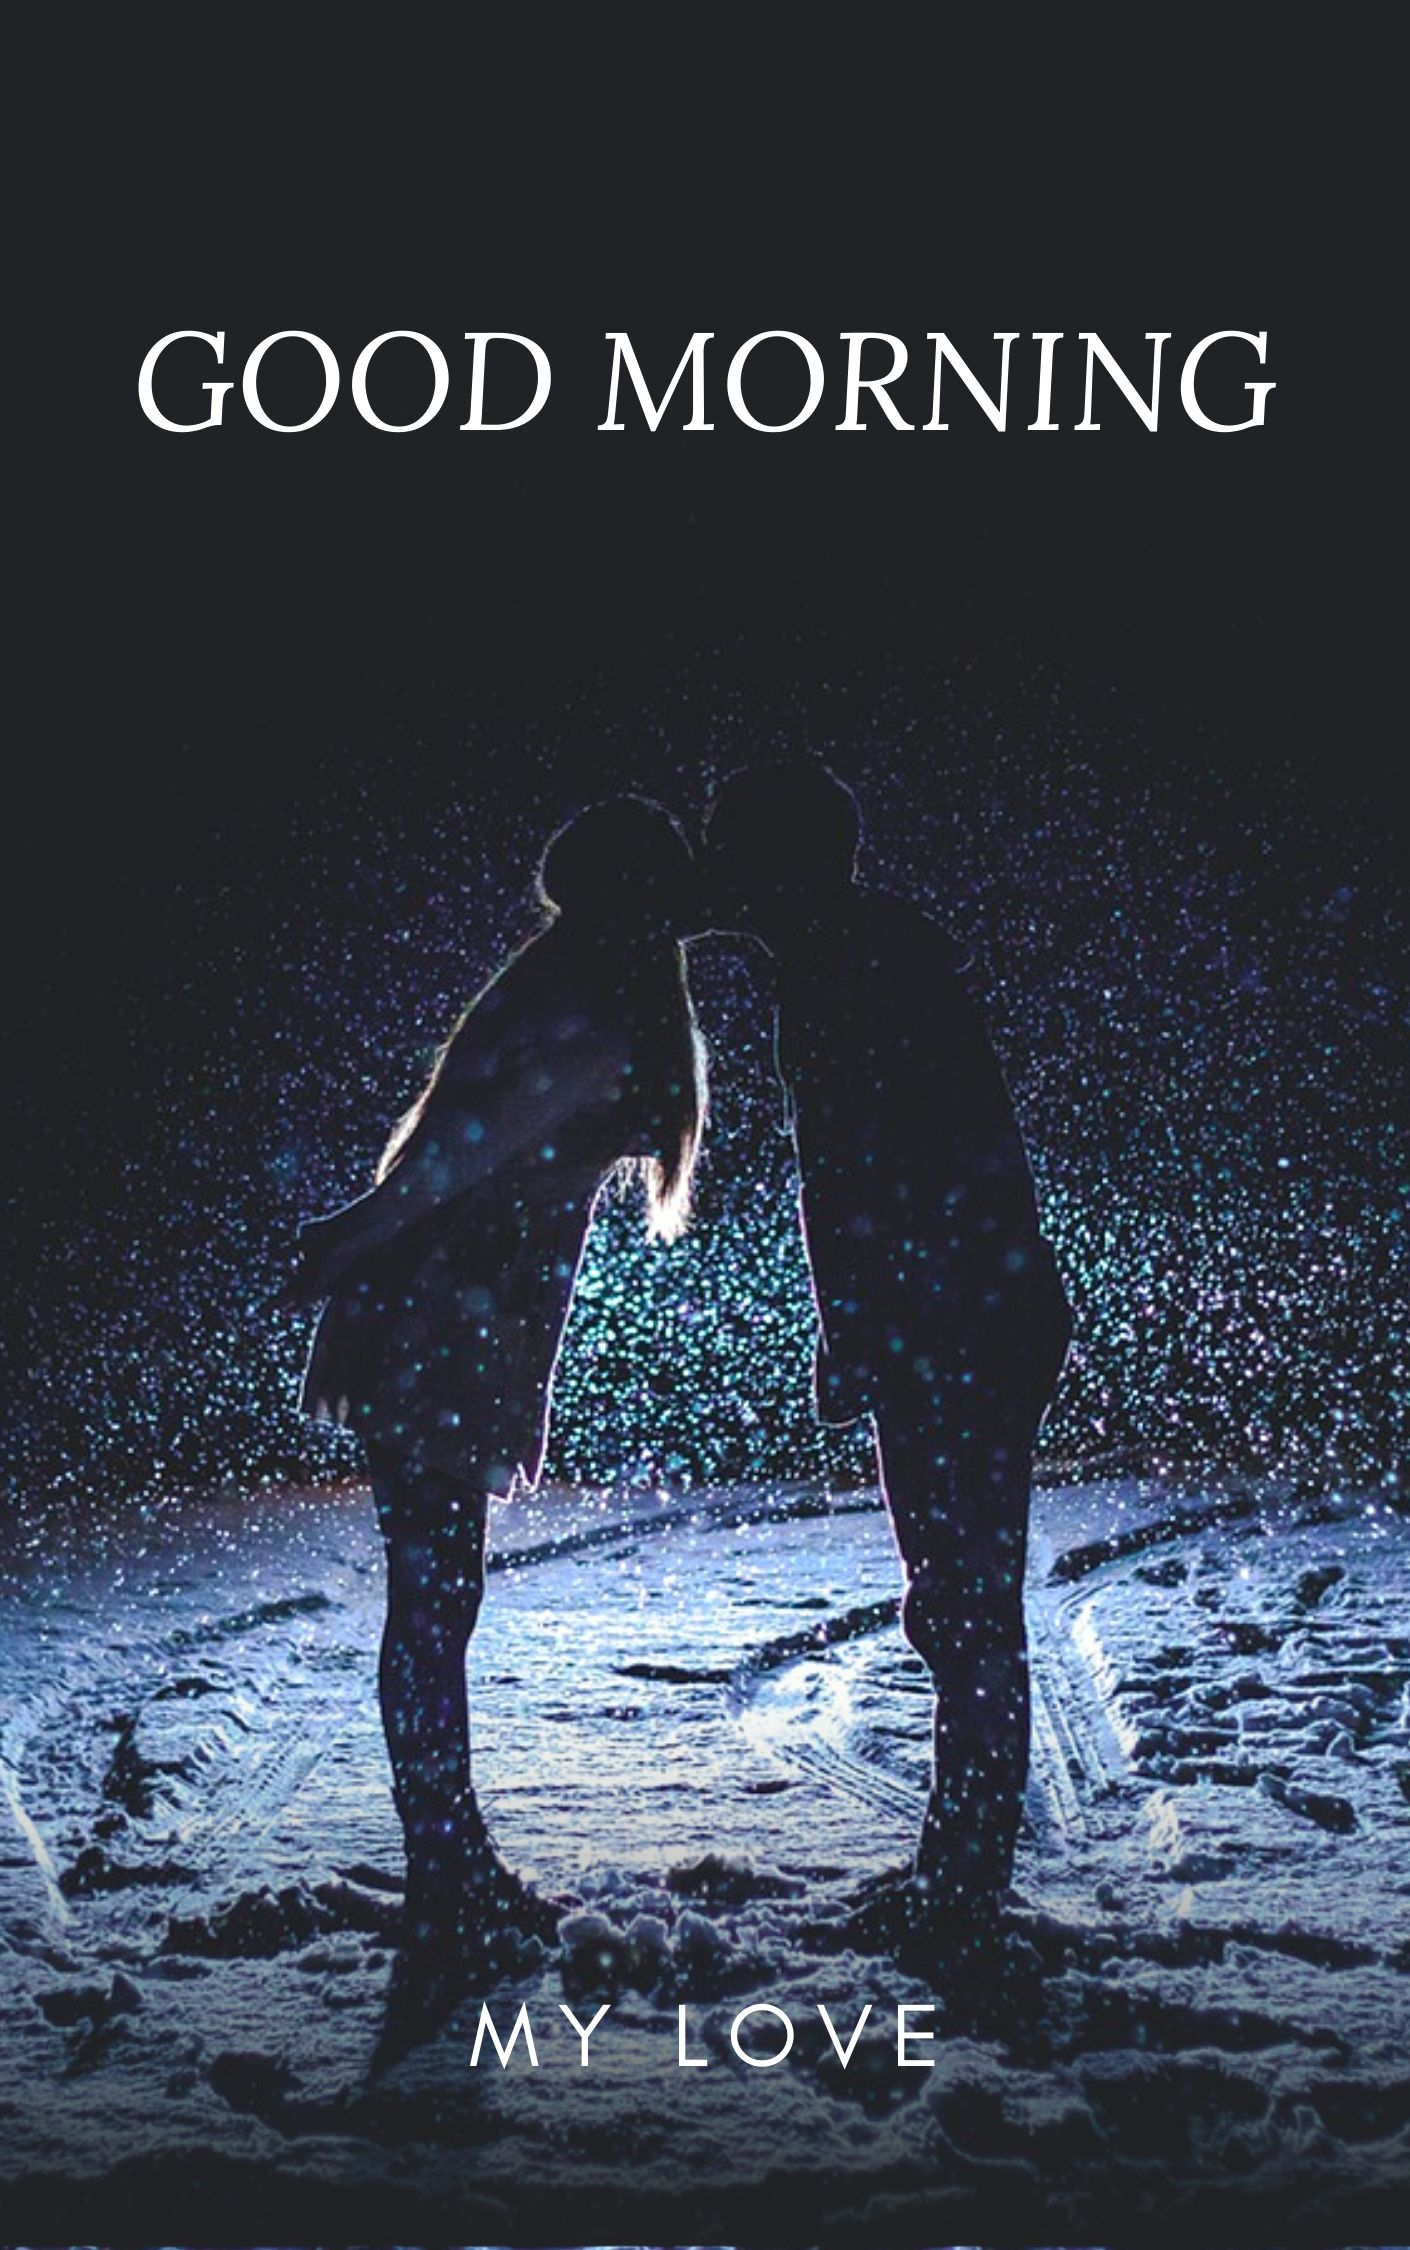 Good Night My Love full HD free download.